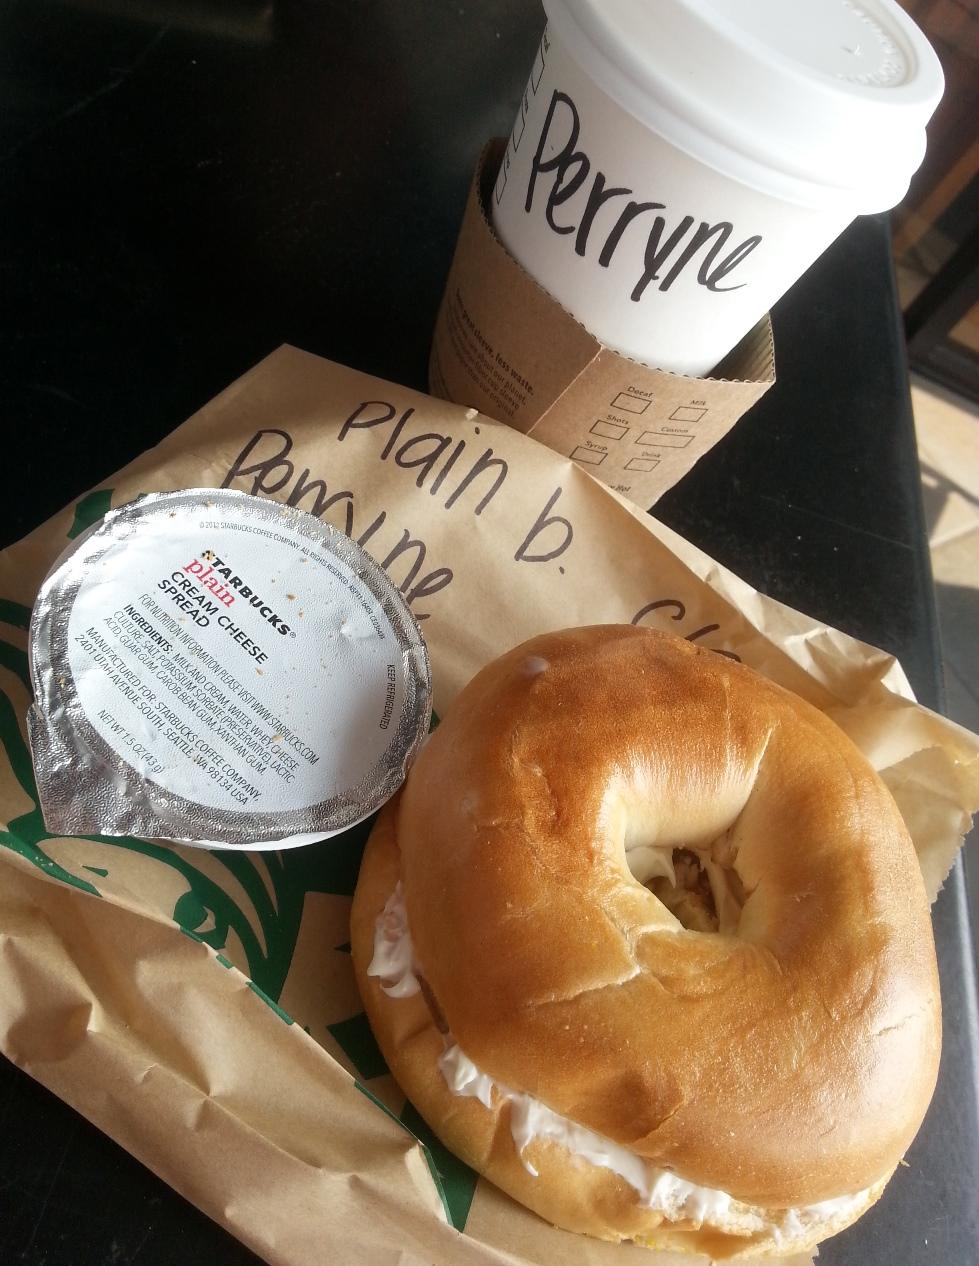 Déjeuner Starbucks France